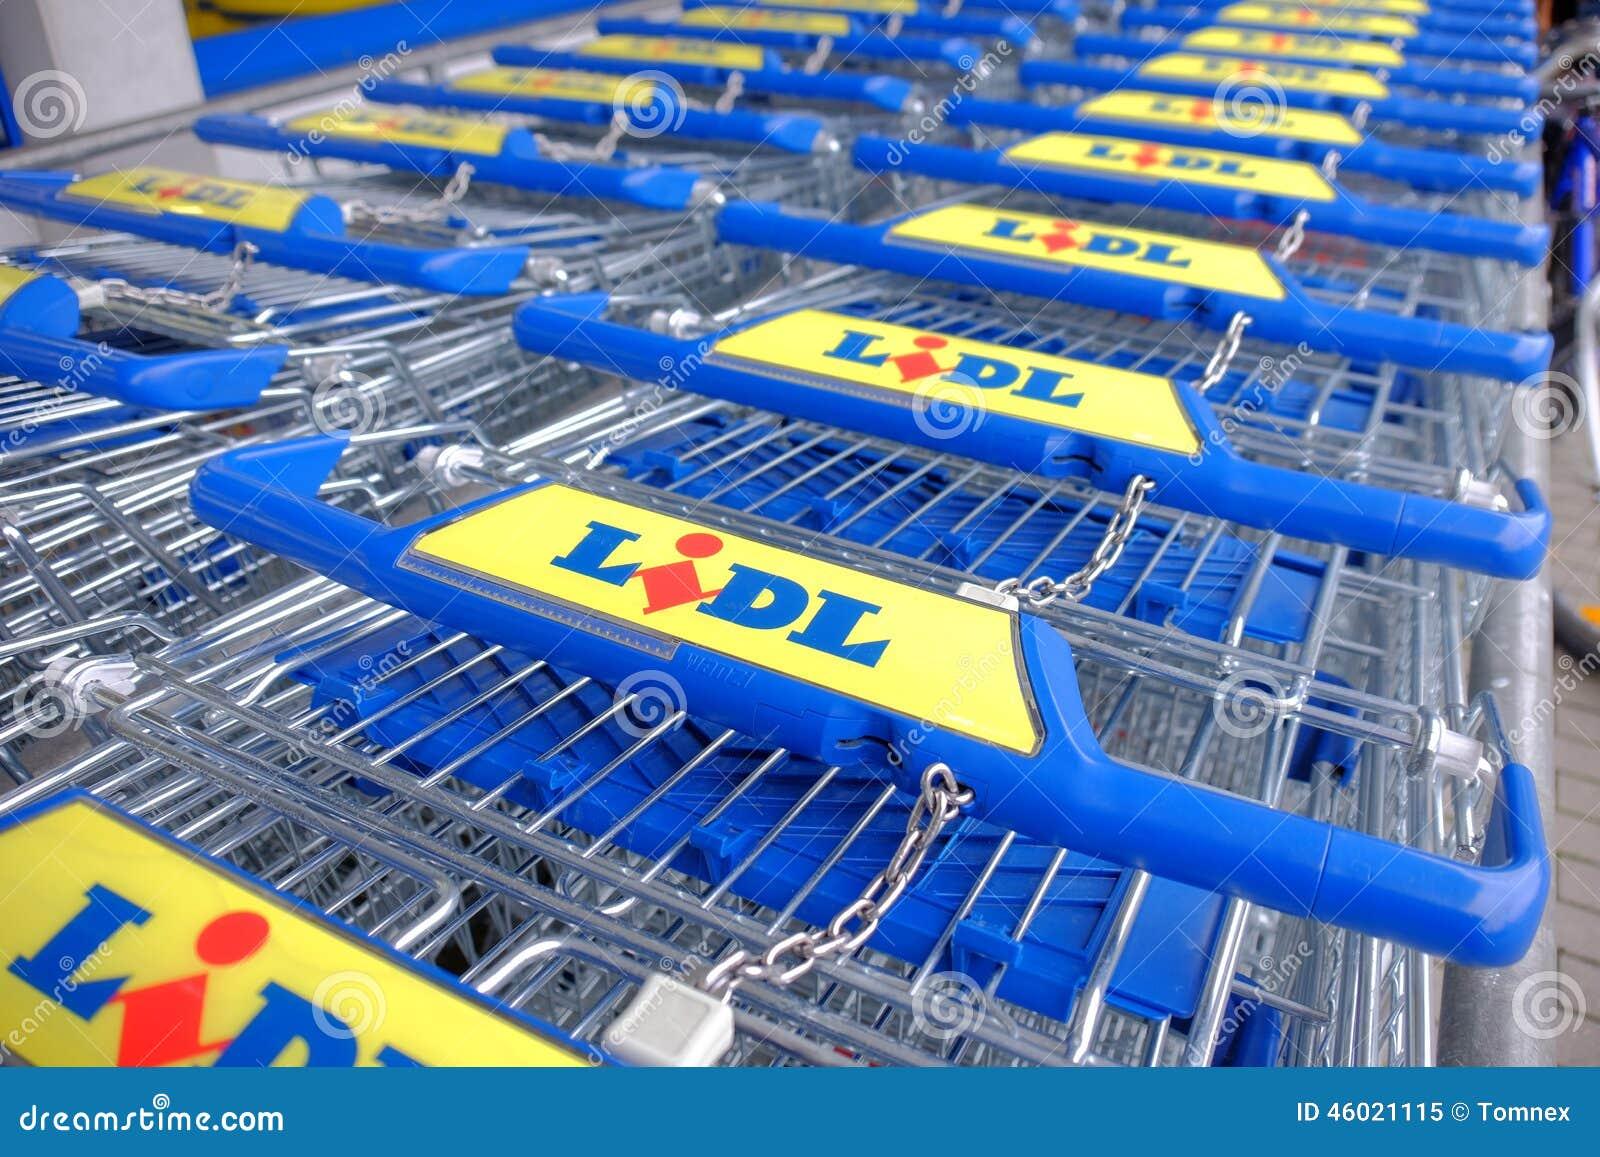 new lidl shopping carts editorial image image 46021115. Black Bedroom Furniture Sets. Home Design Ideas